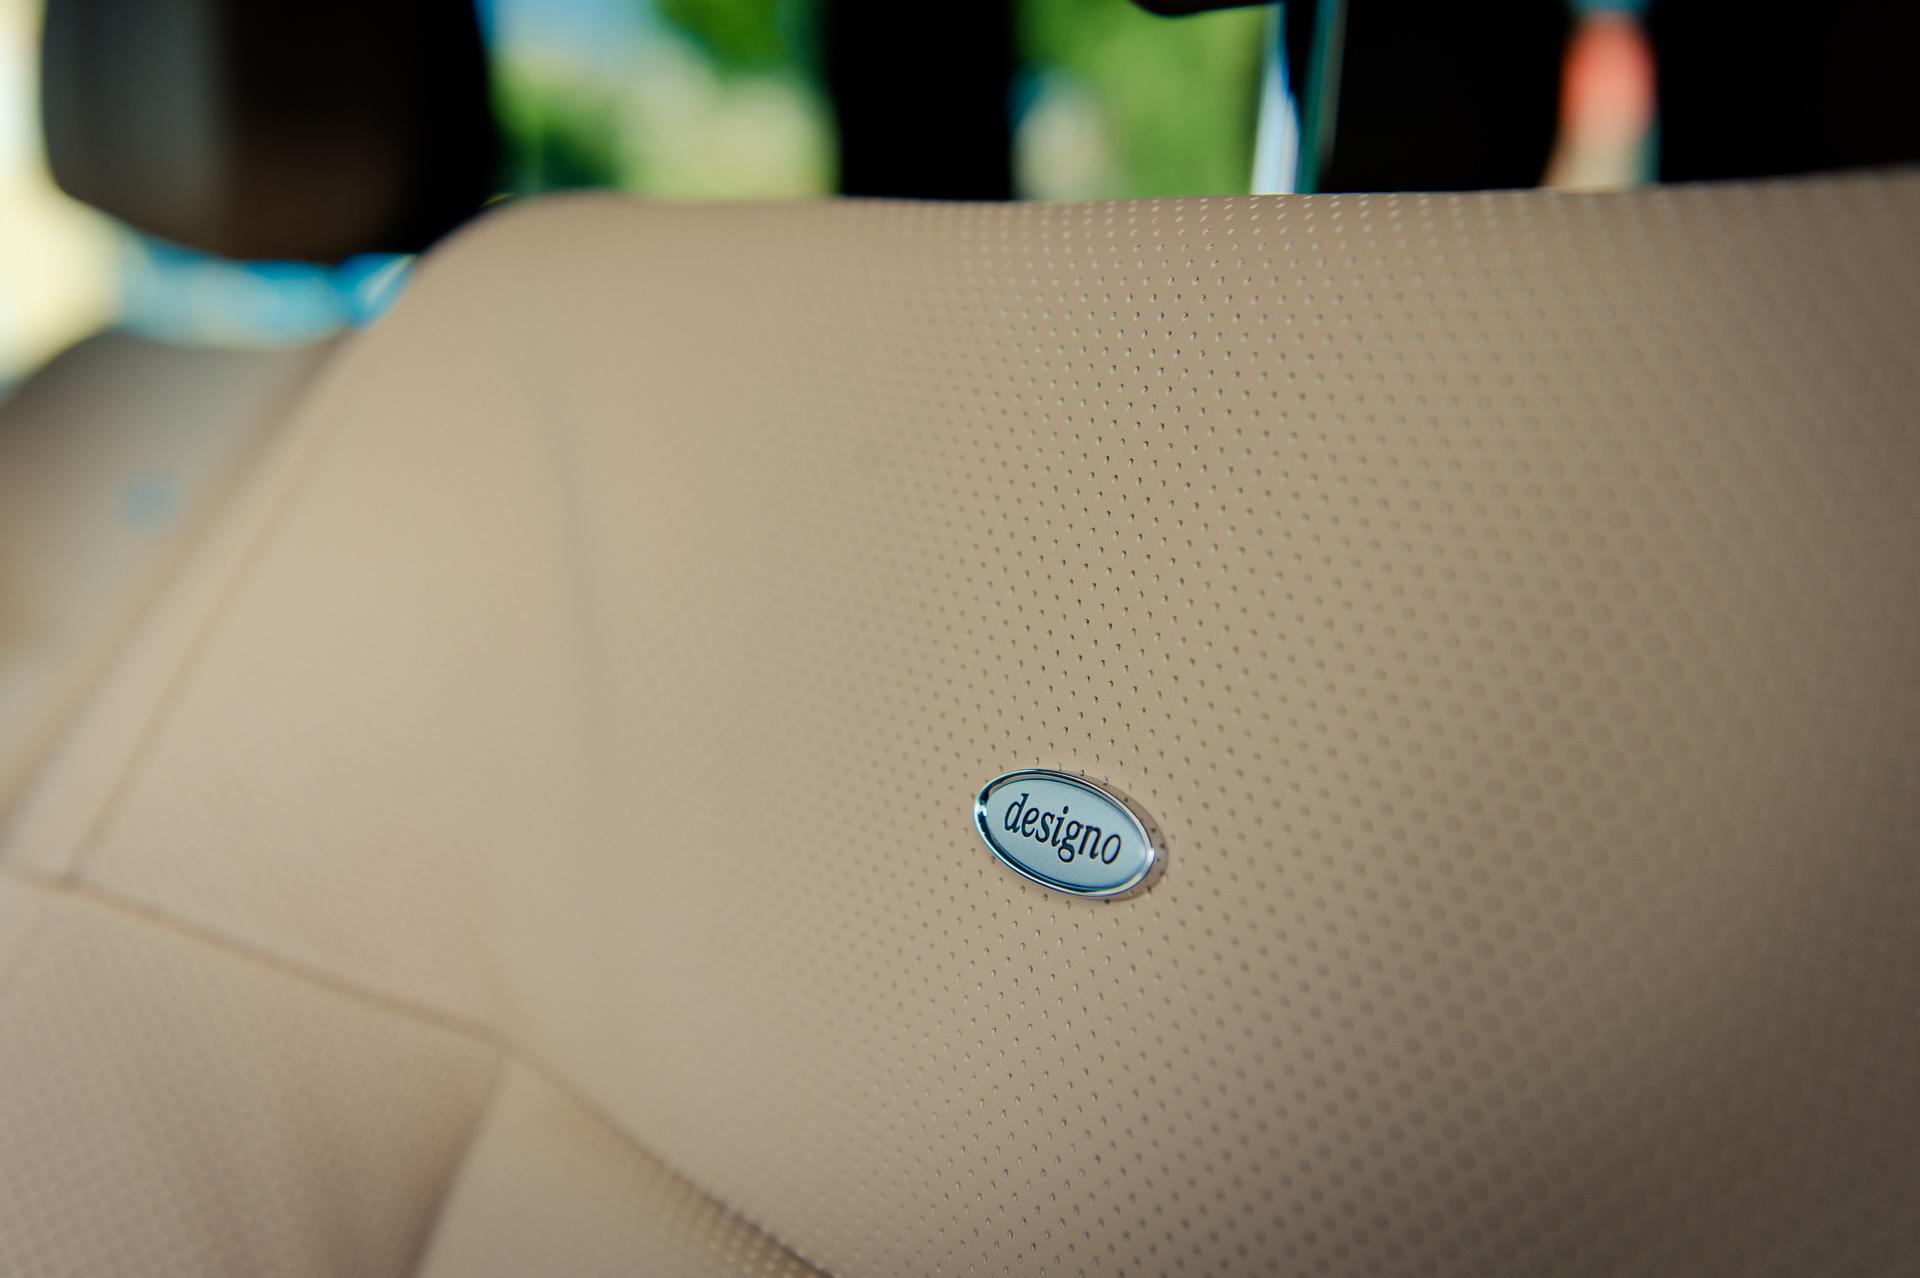 2014-Mercedes-Benz-G500-G550-braun-Kalifornien-mbrt14-40